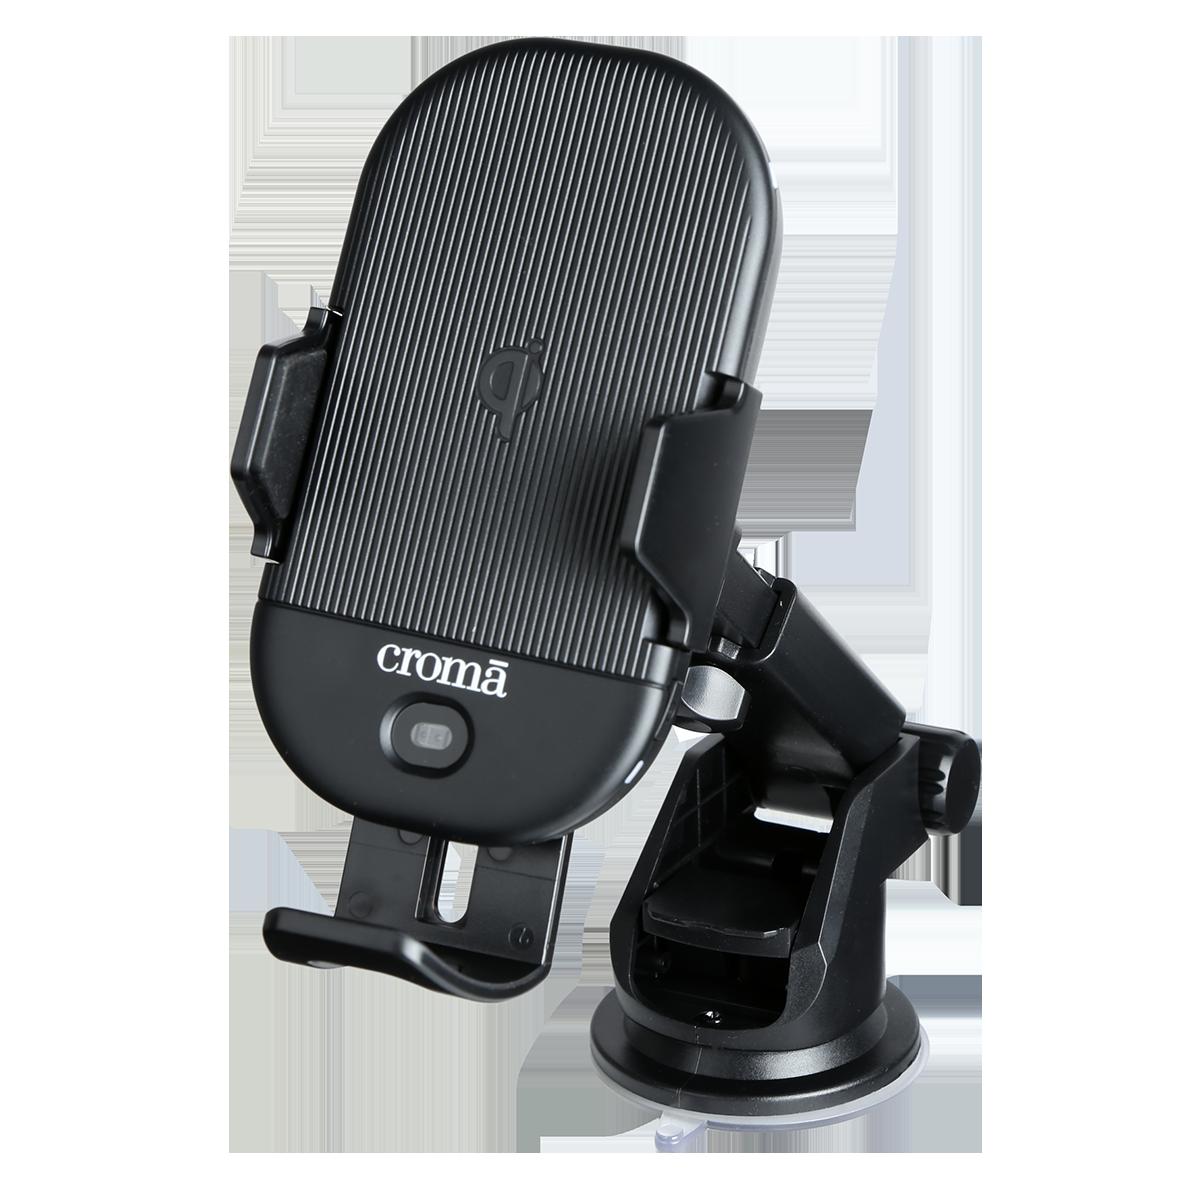 Croma 15 Watts Car Charging Adapter (Air Vent Clamp, CRCA2306, Black)